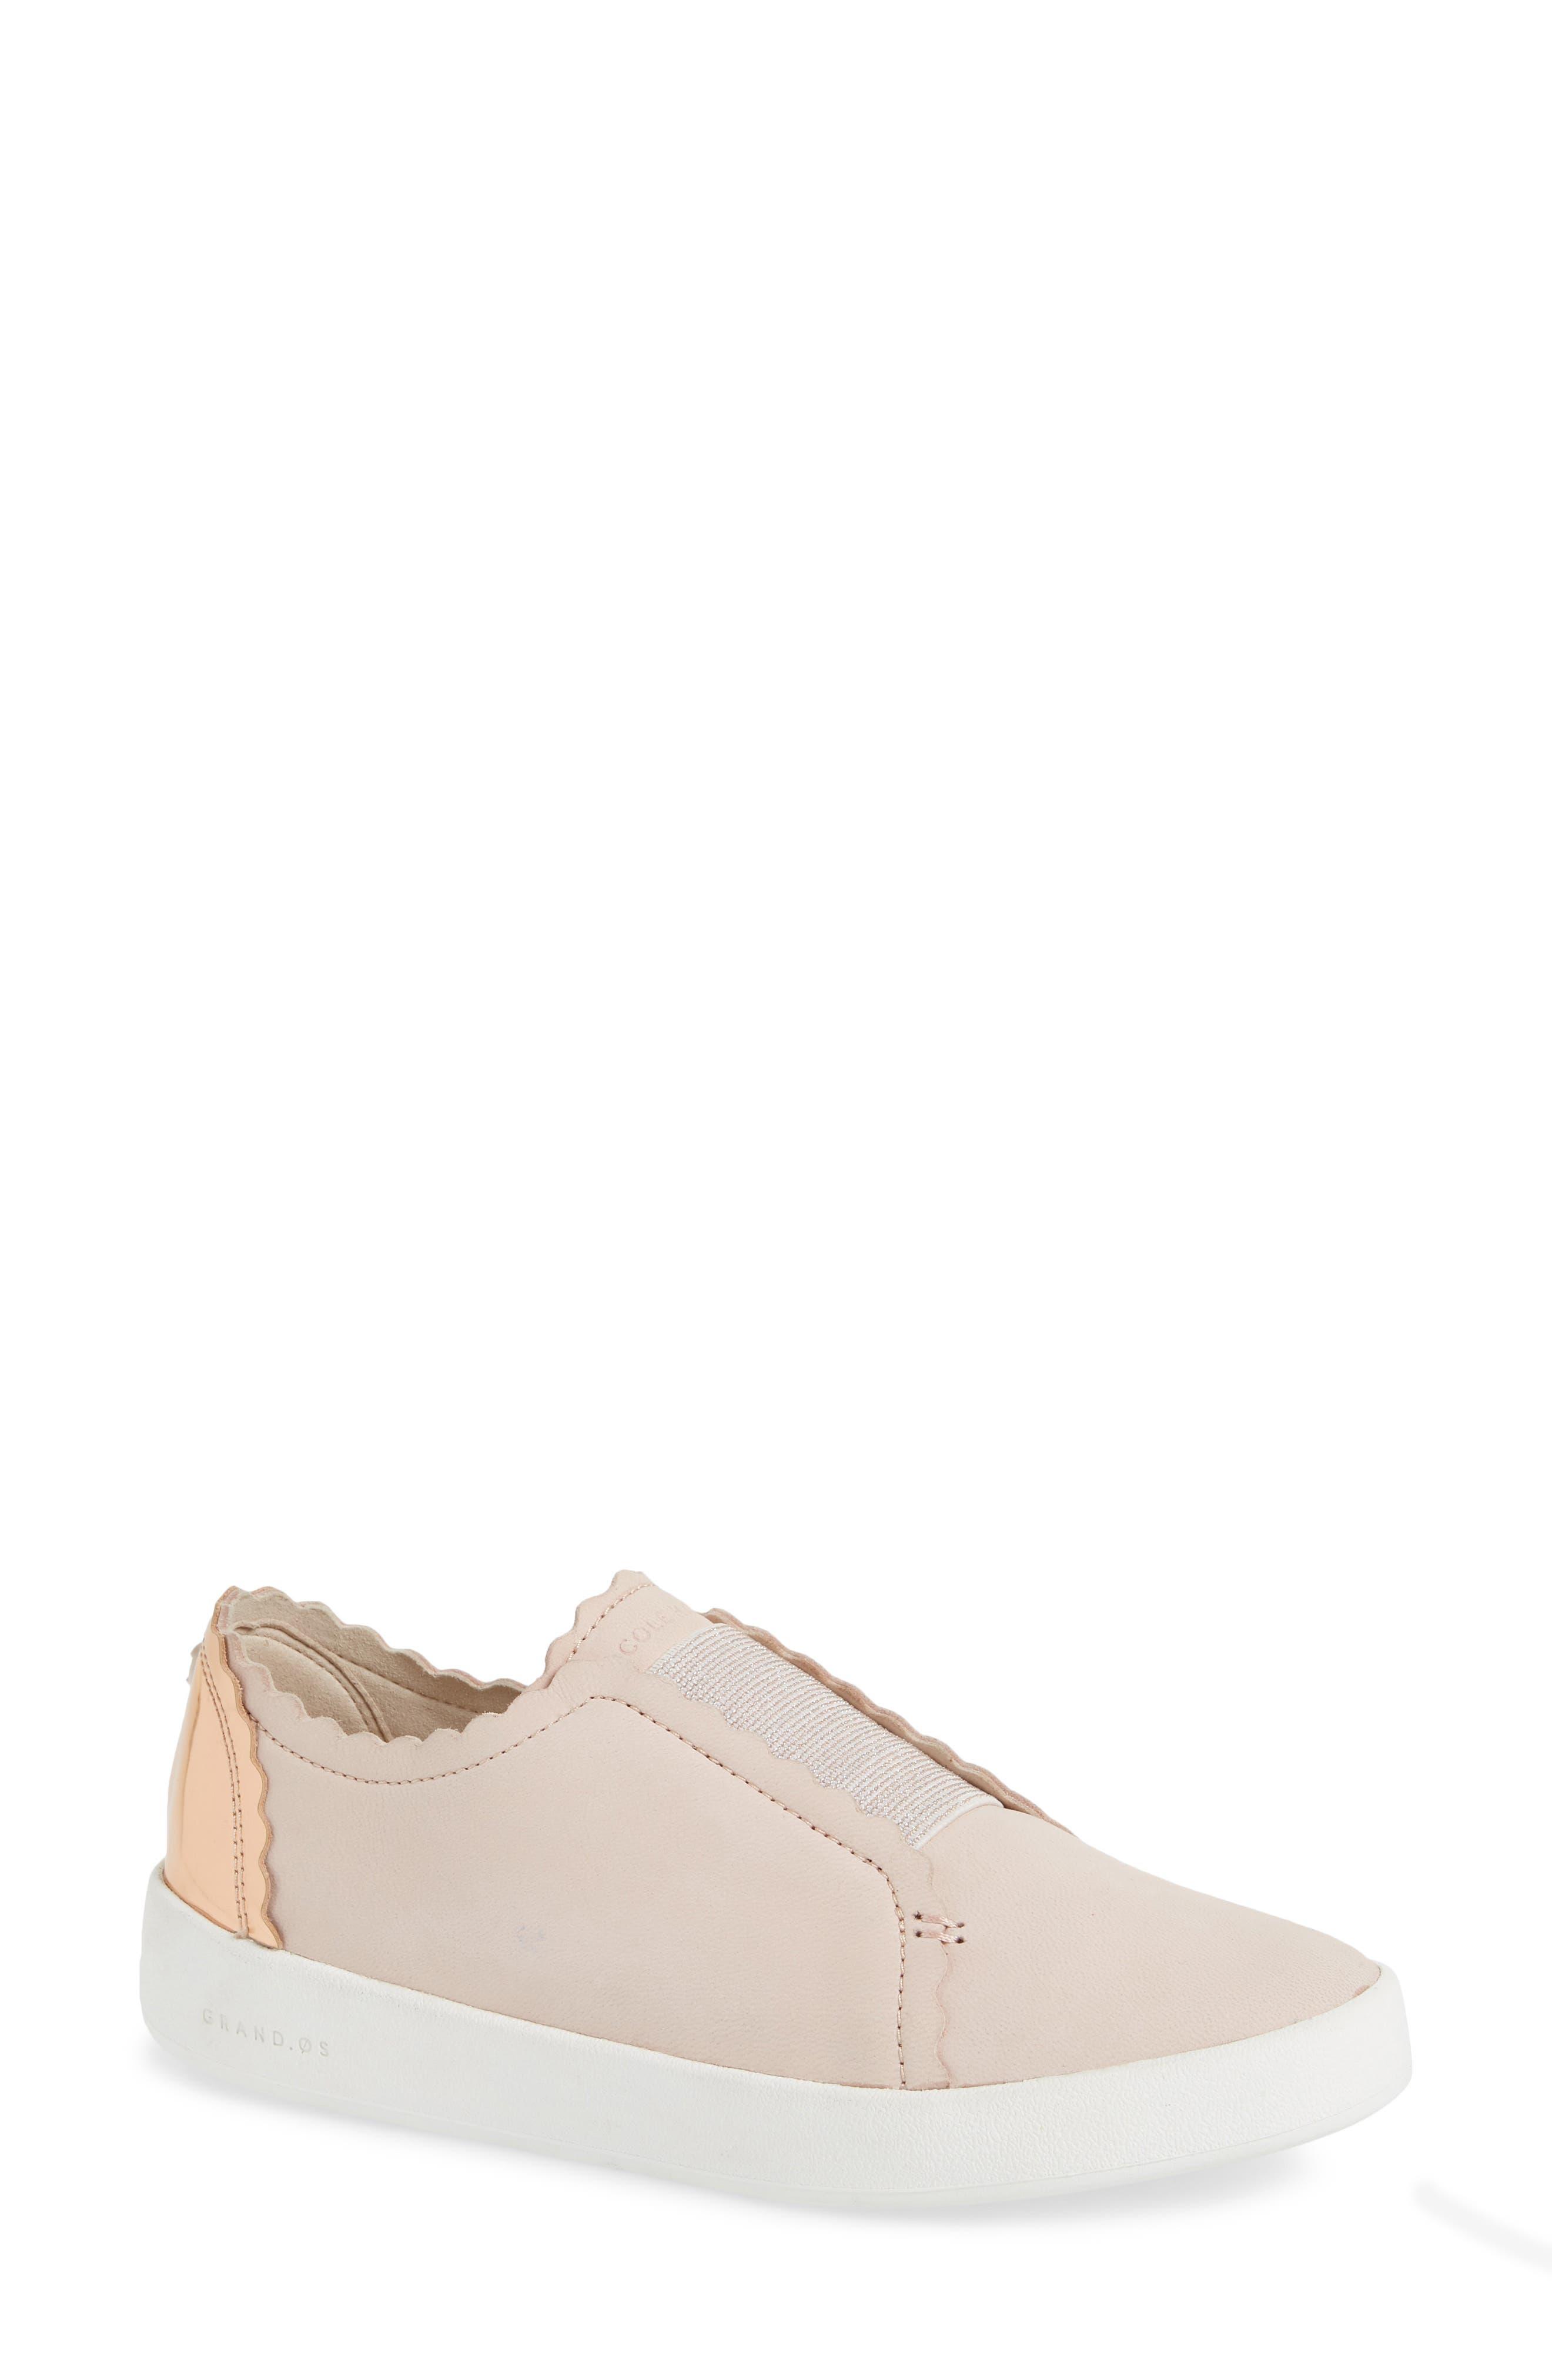 COLE HAAN GrandPro Spectator Scalloped Slip-On Sneaker, Main, color, PEACH BLUSH NUBUCK